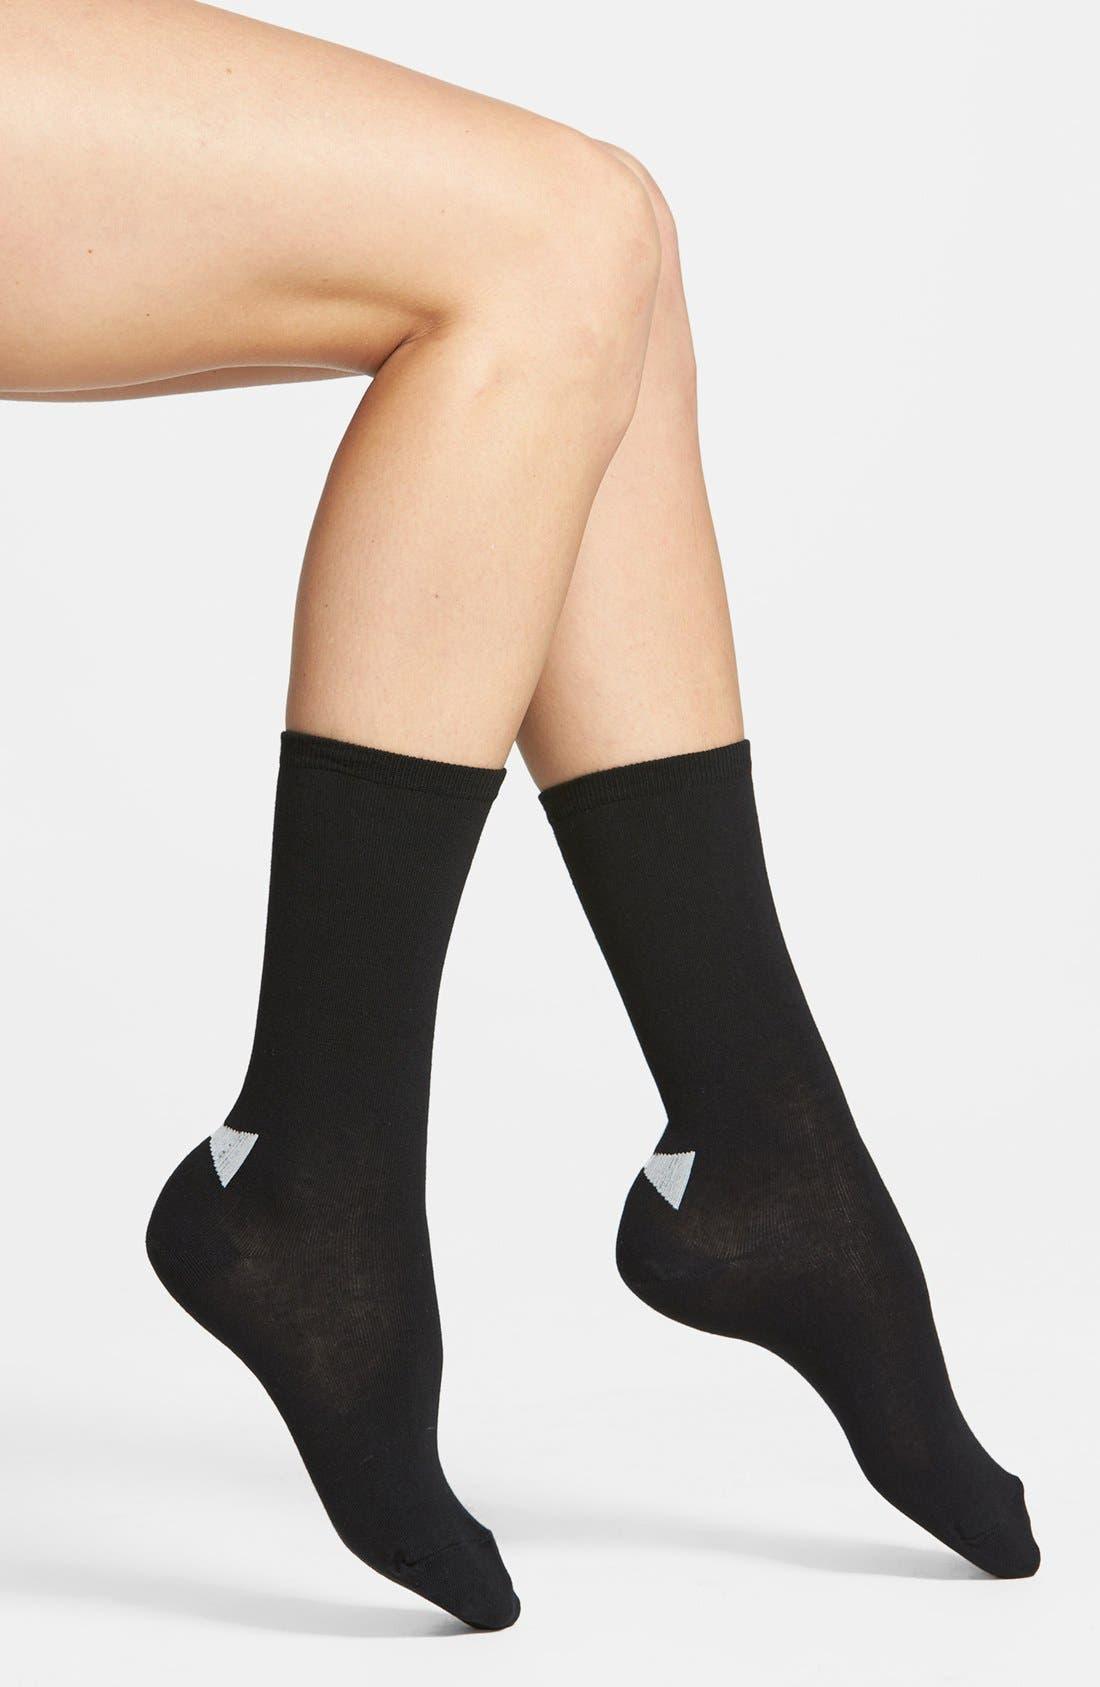 Alternate Image 1 Selected - kate spade new york 'bow' crew socks